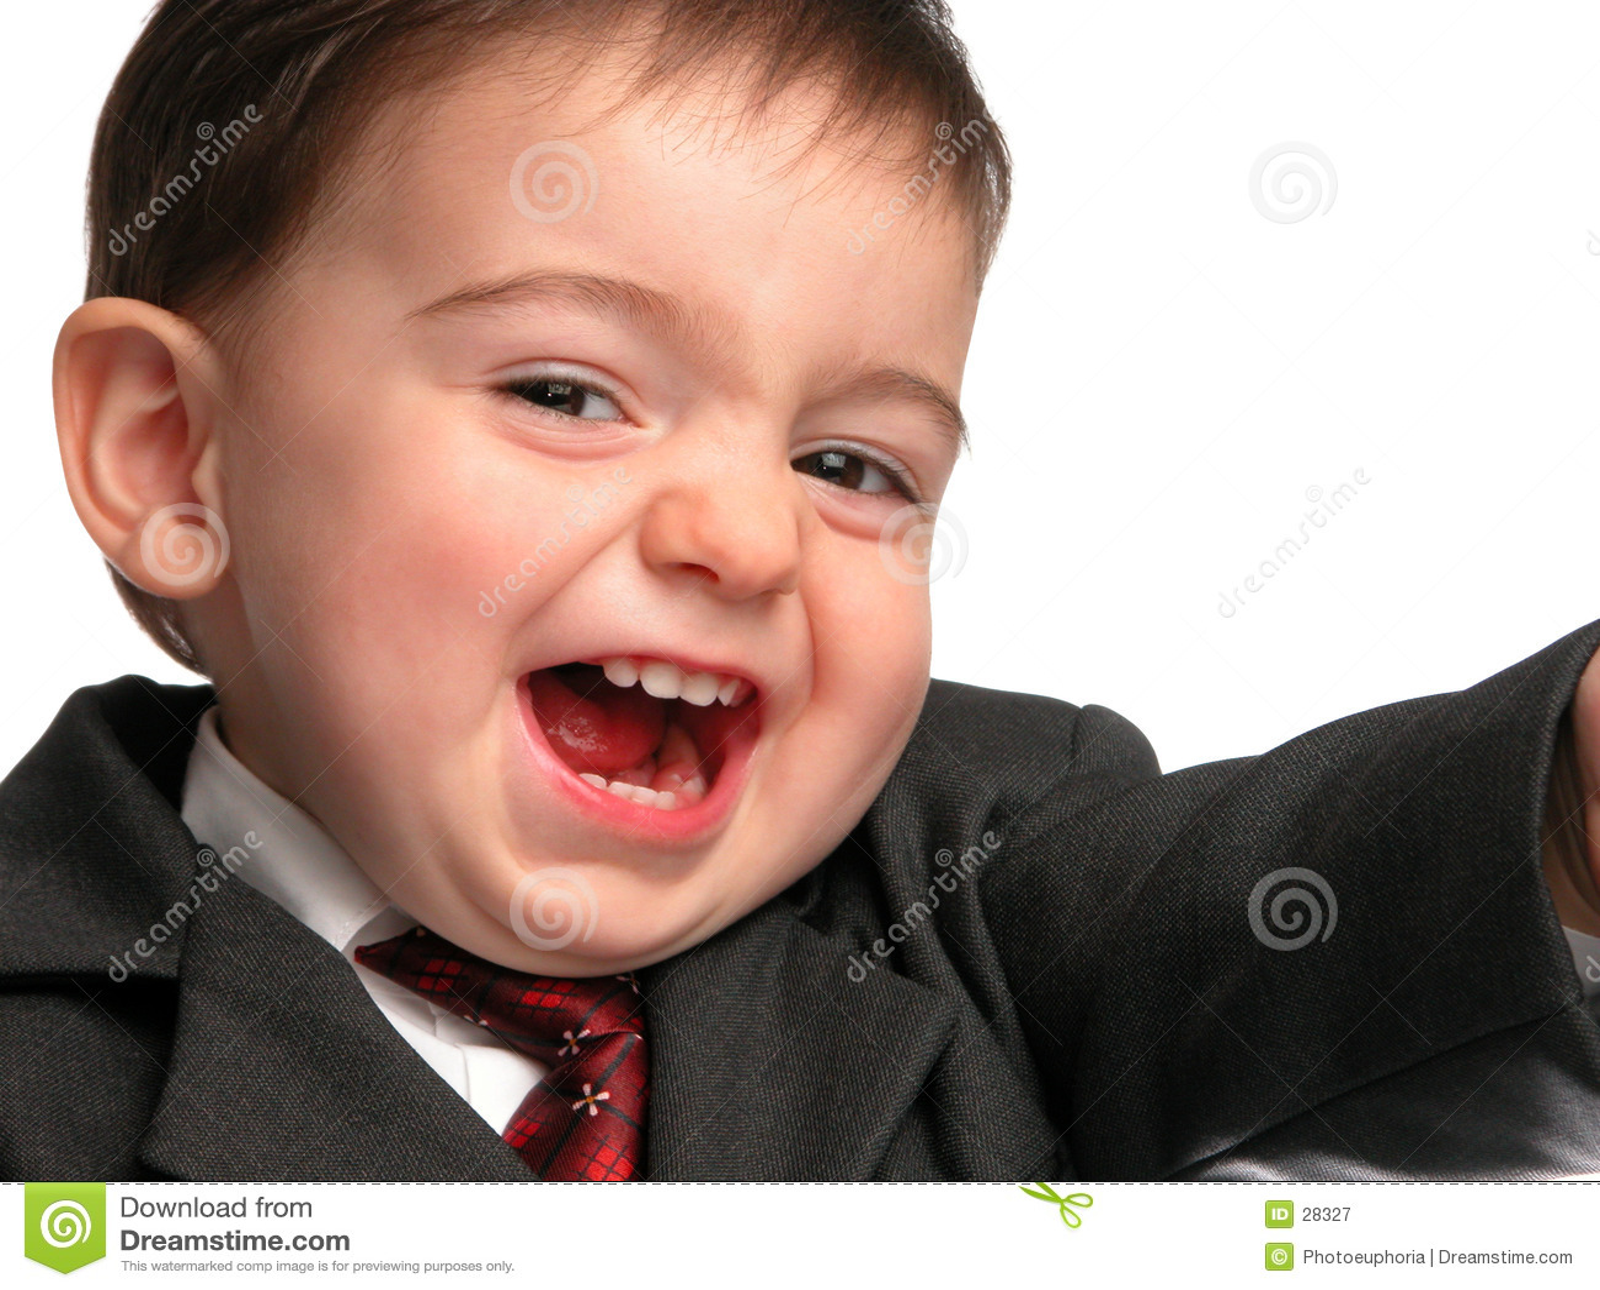 Kleine Mann-Serie: Verkäufer-Lächeln